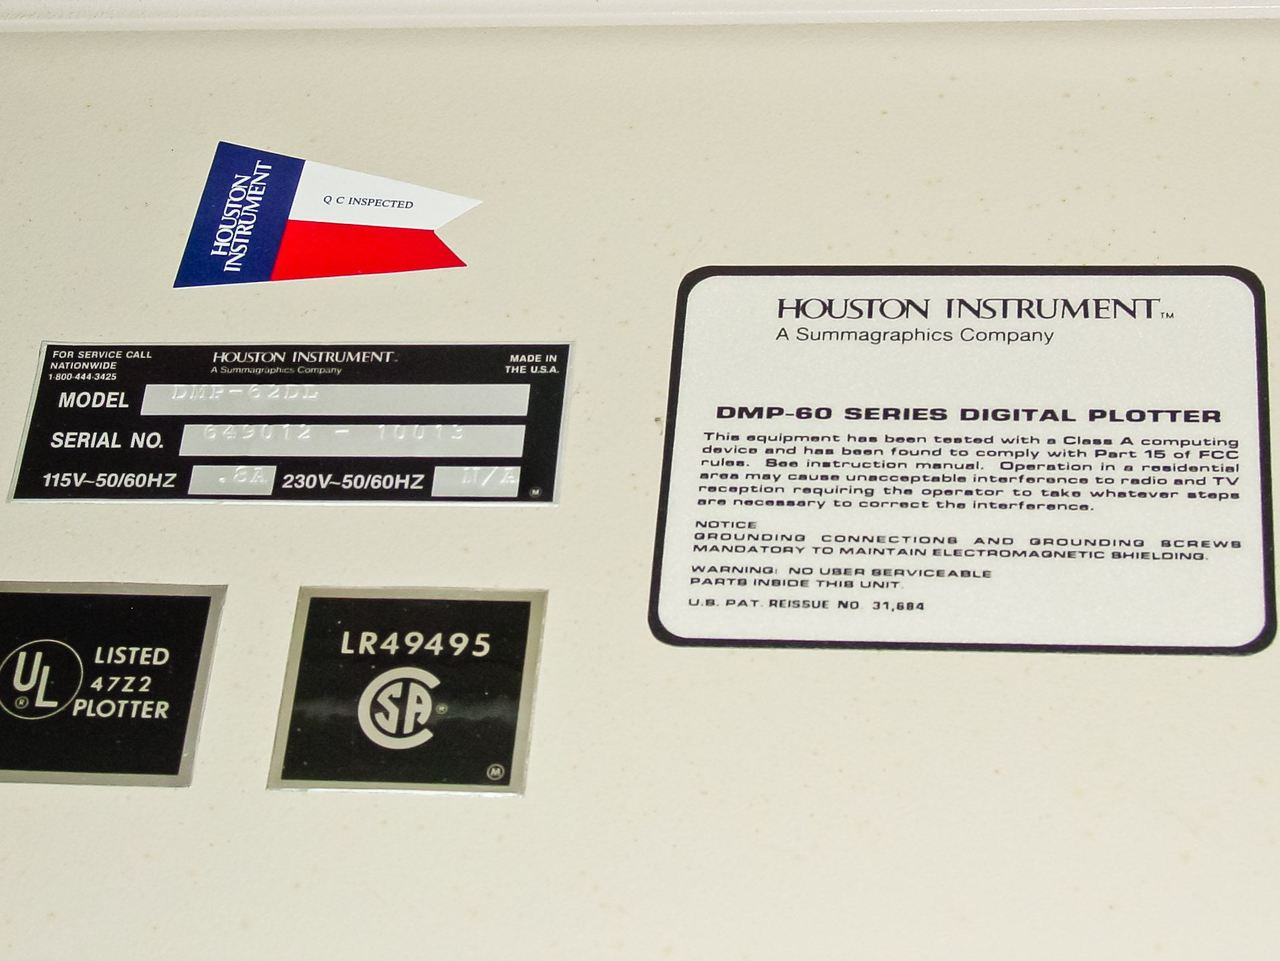 Houston Instruments DMP-60 DL Series / MP80 Medium Format Pen Plotter